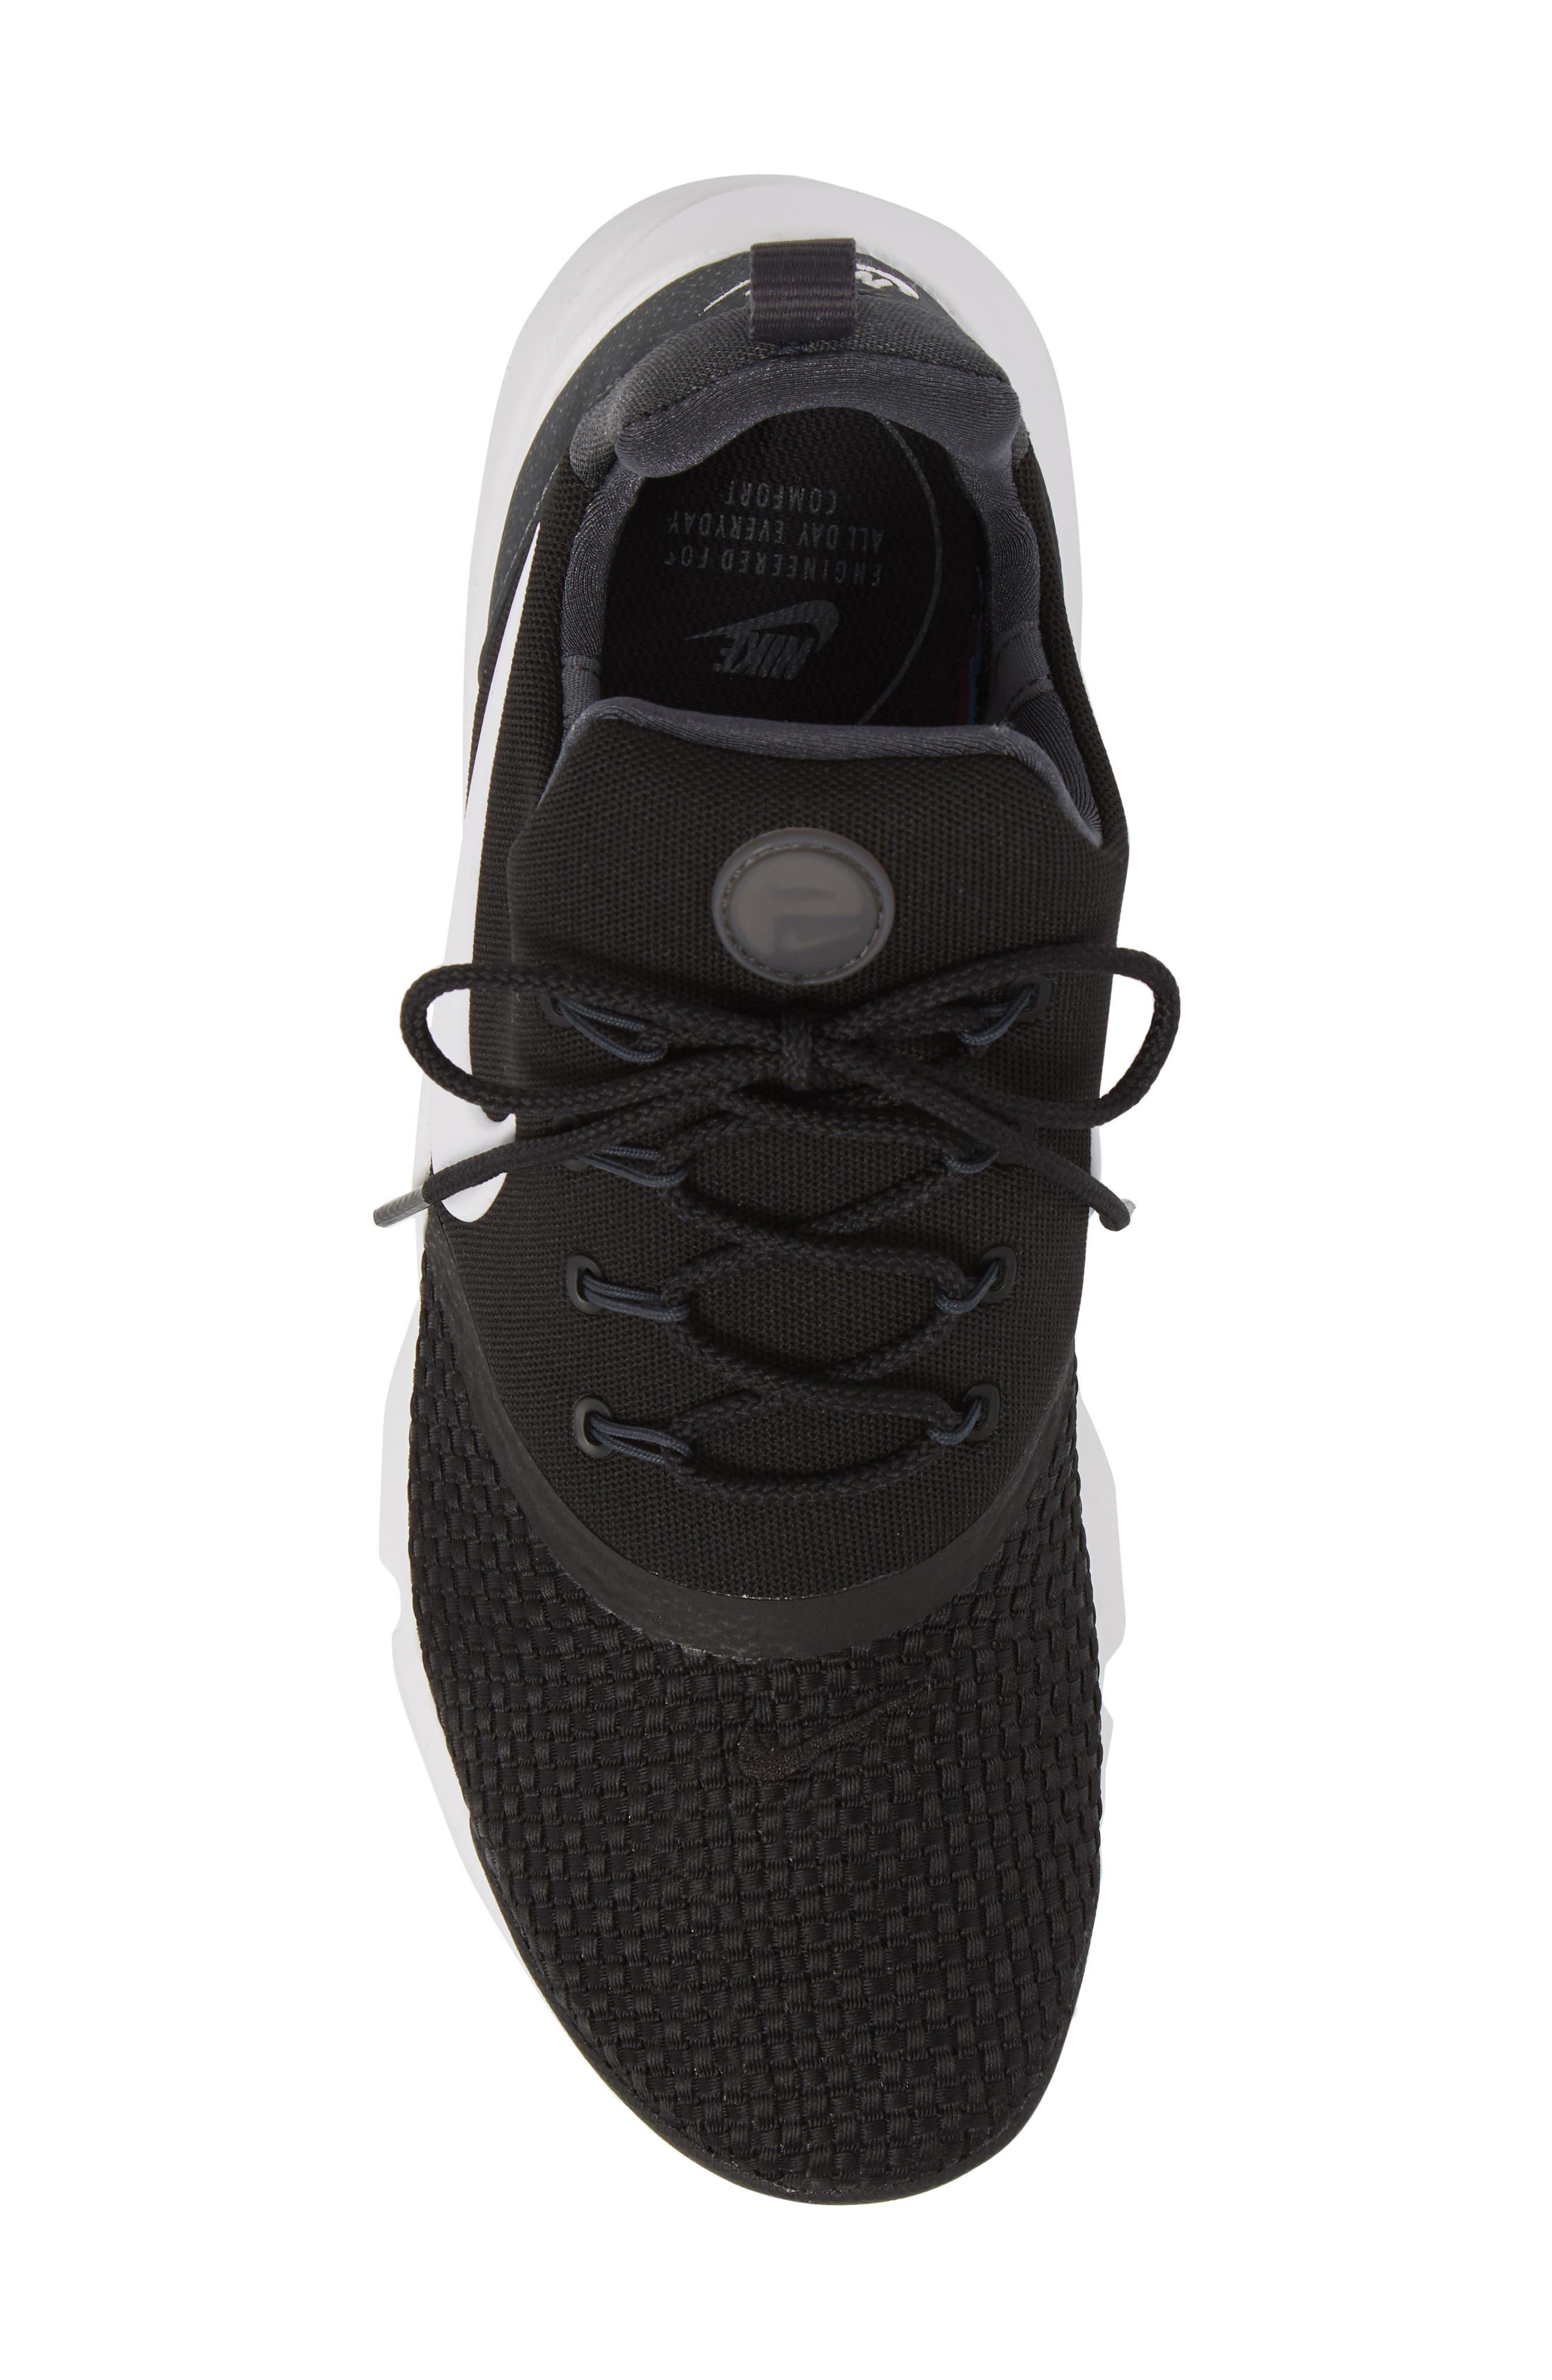 Presto Fly Sneaker,                             Alternate thumbnail 5, color,                             BLACK/ WHITE/ ANTHRACITE